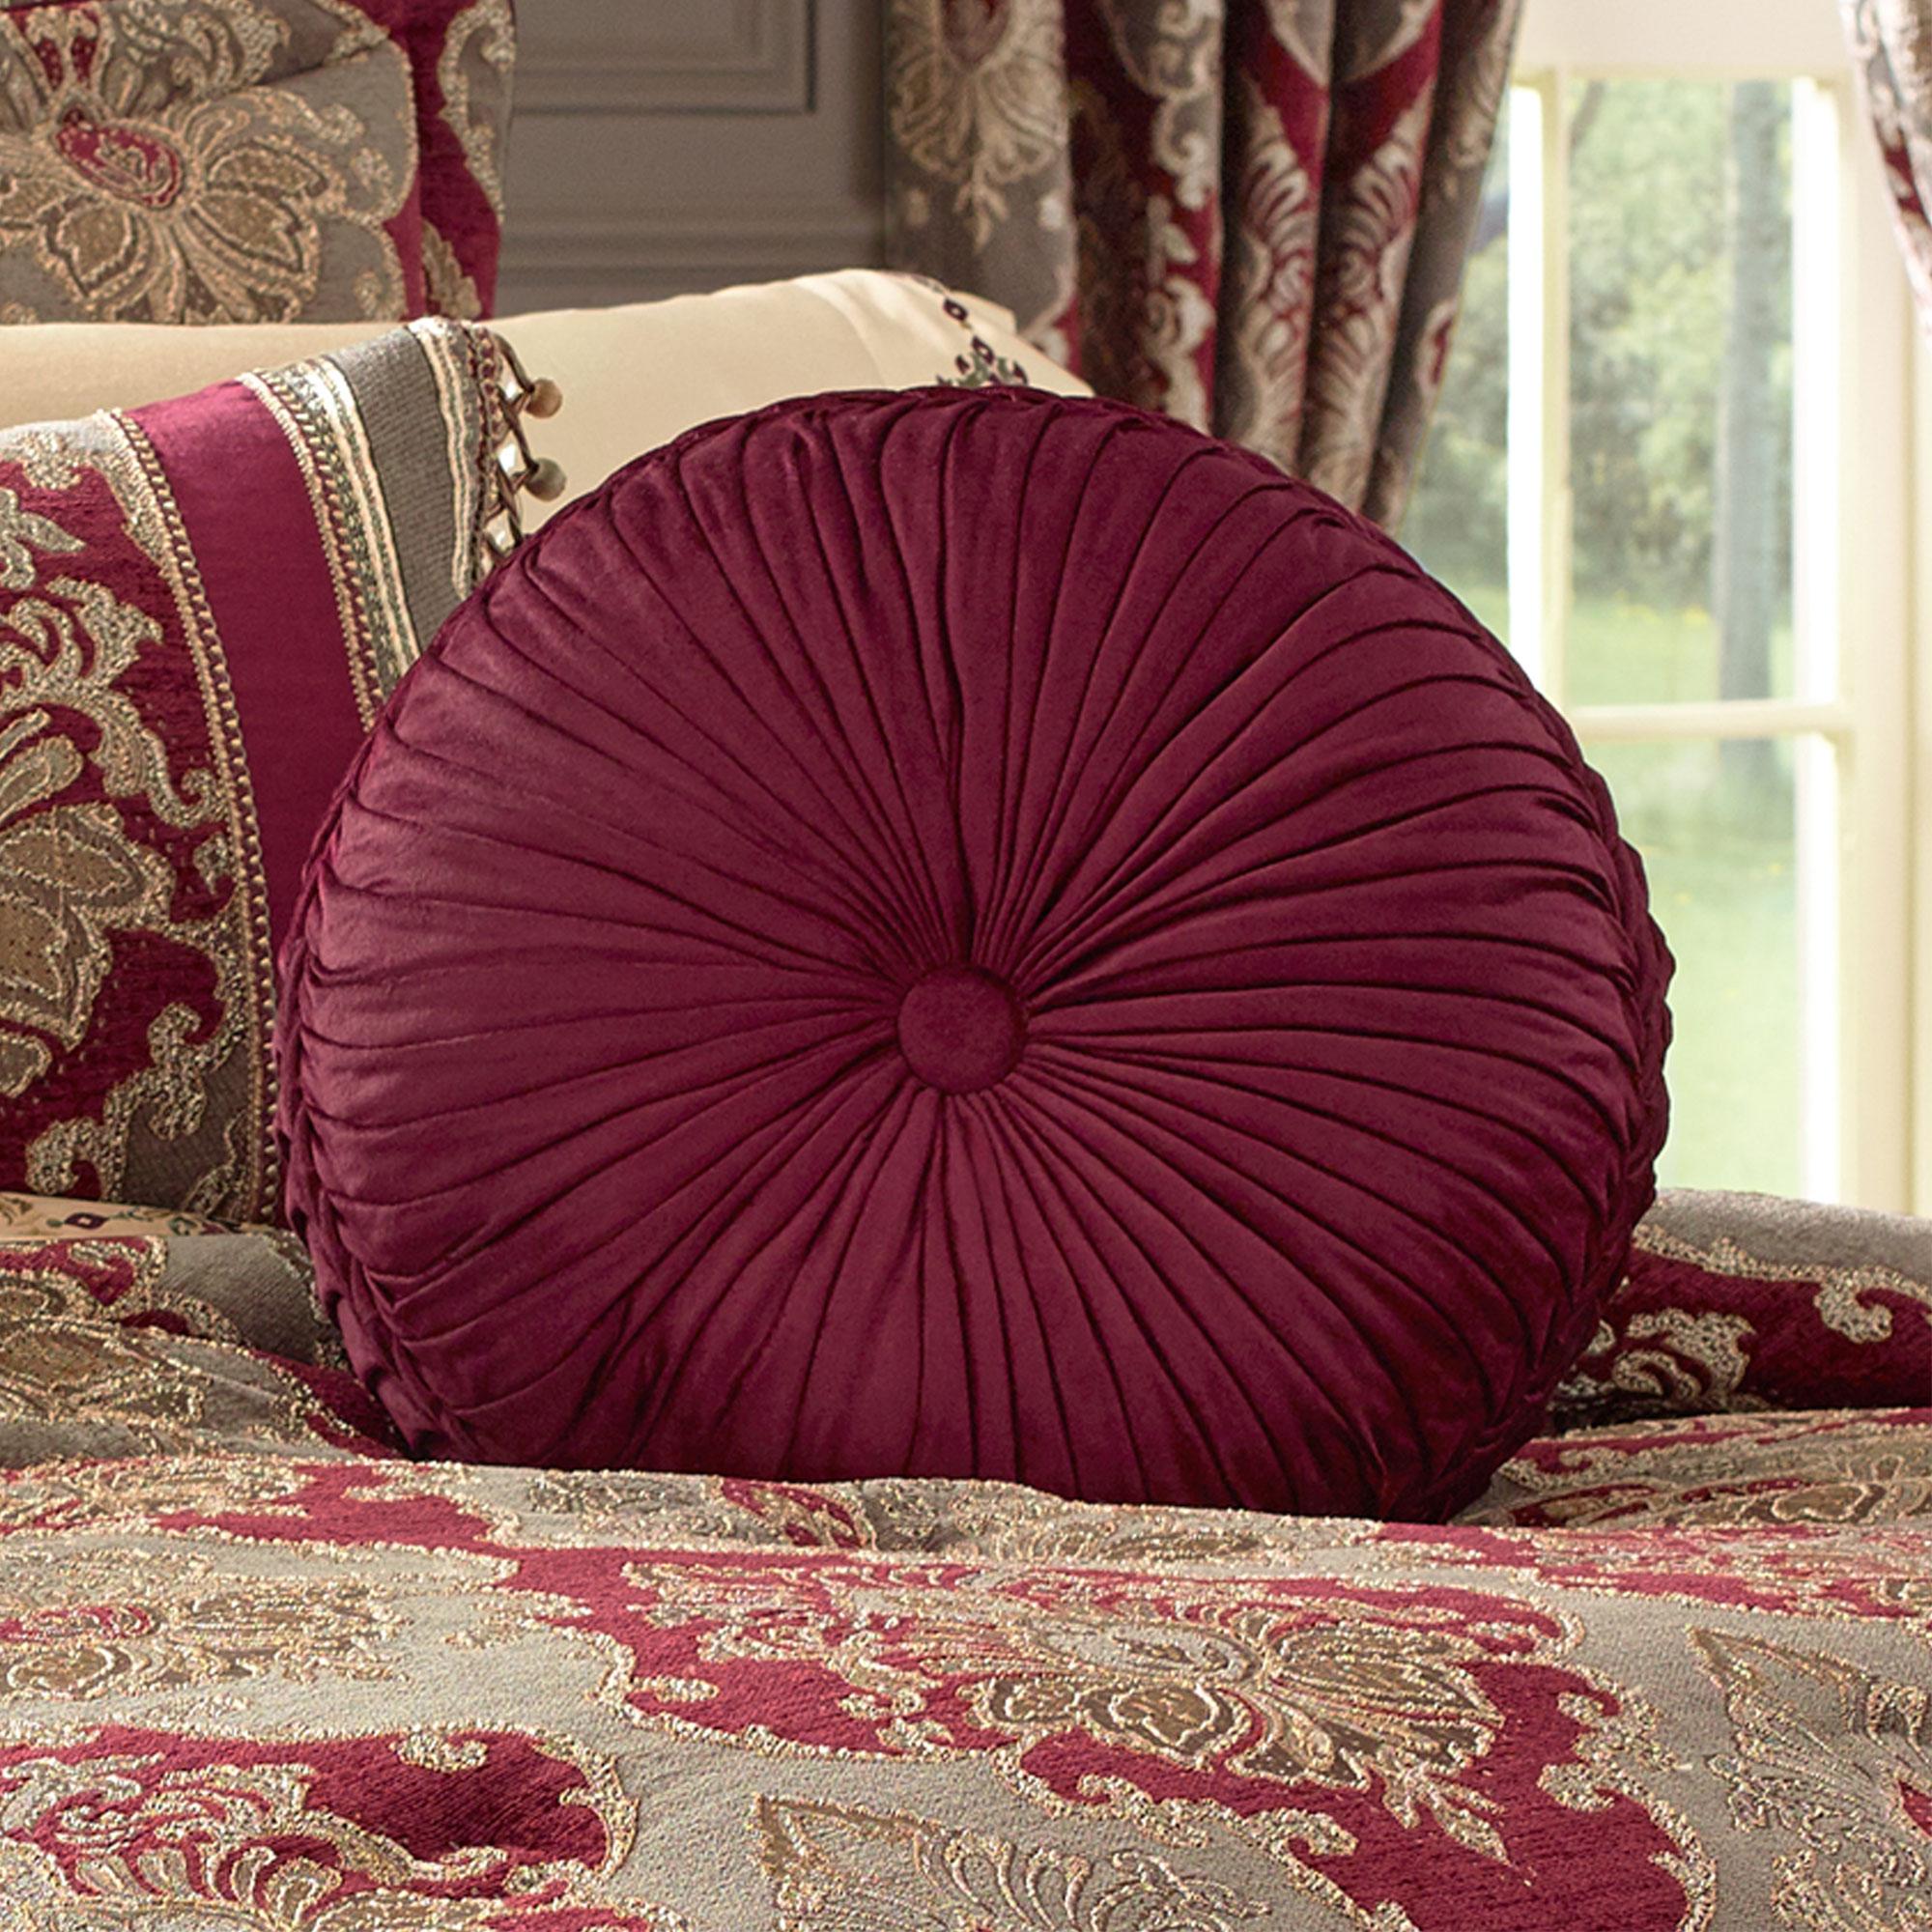 Crimson Cal King 4 Piece Comforter Set